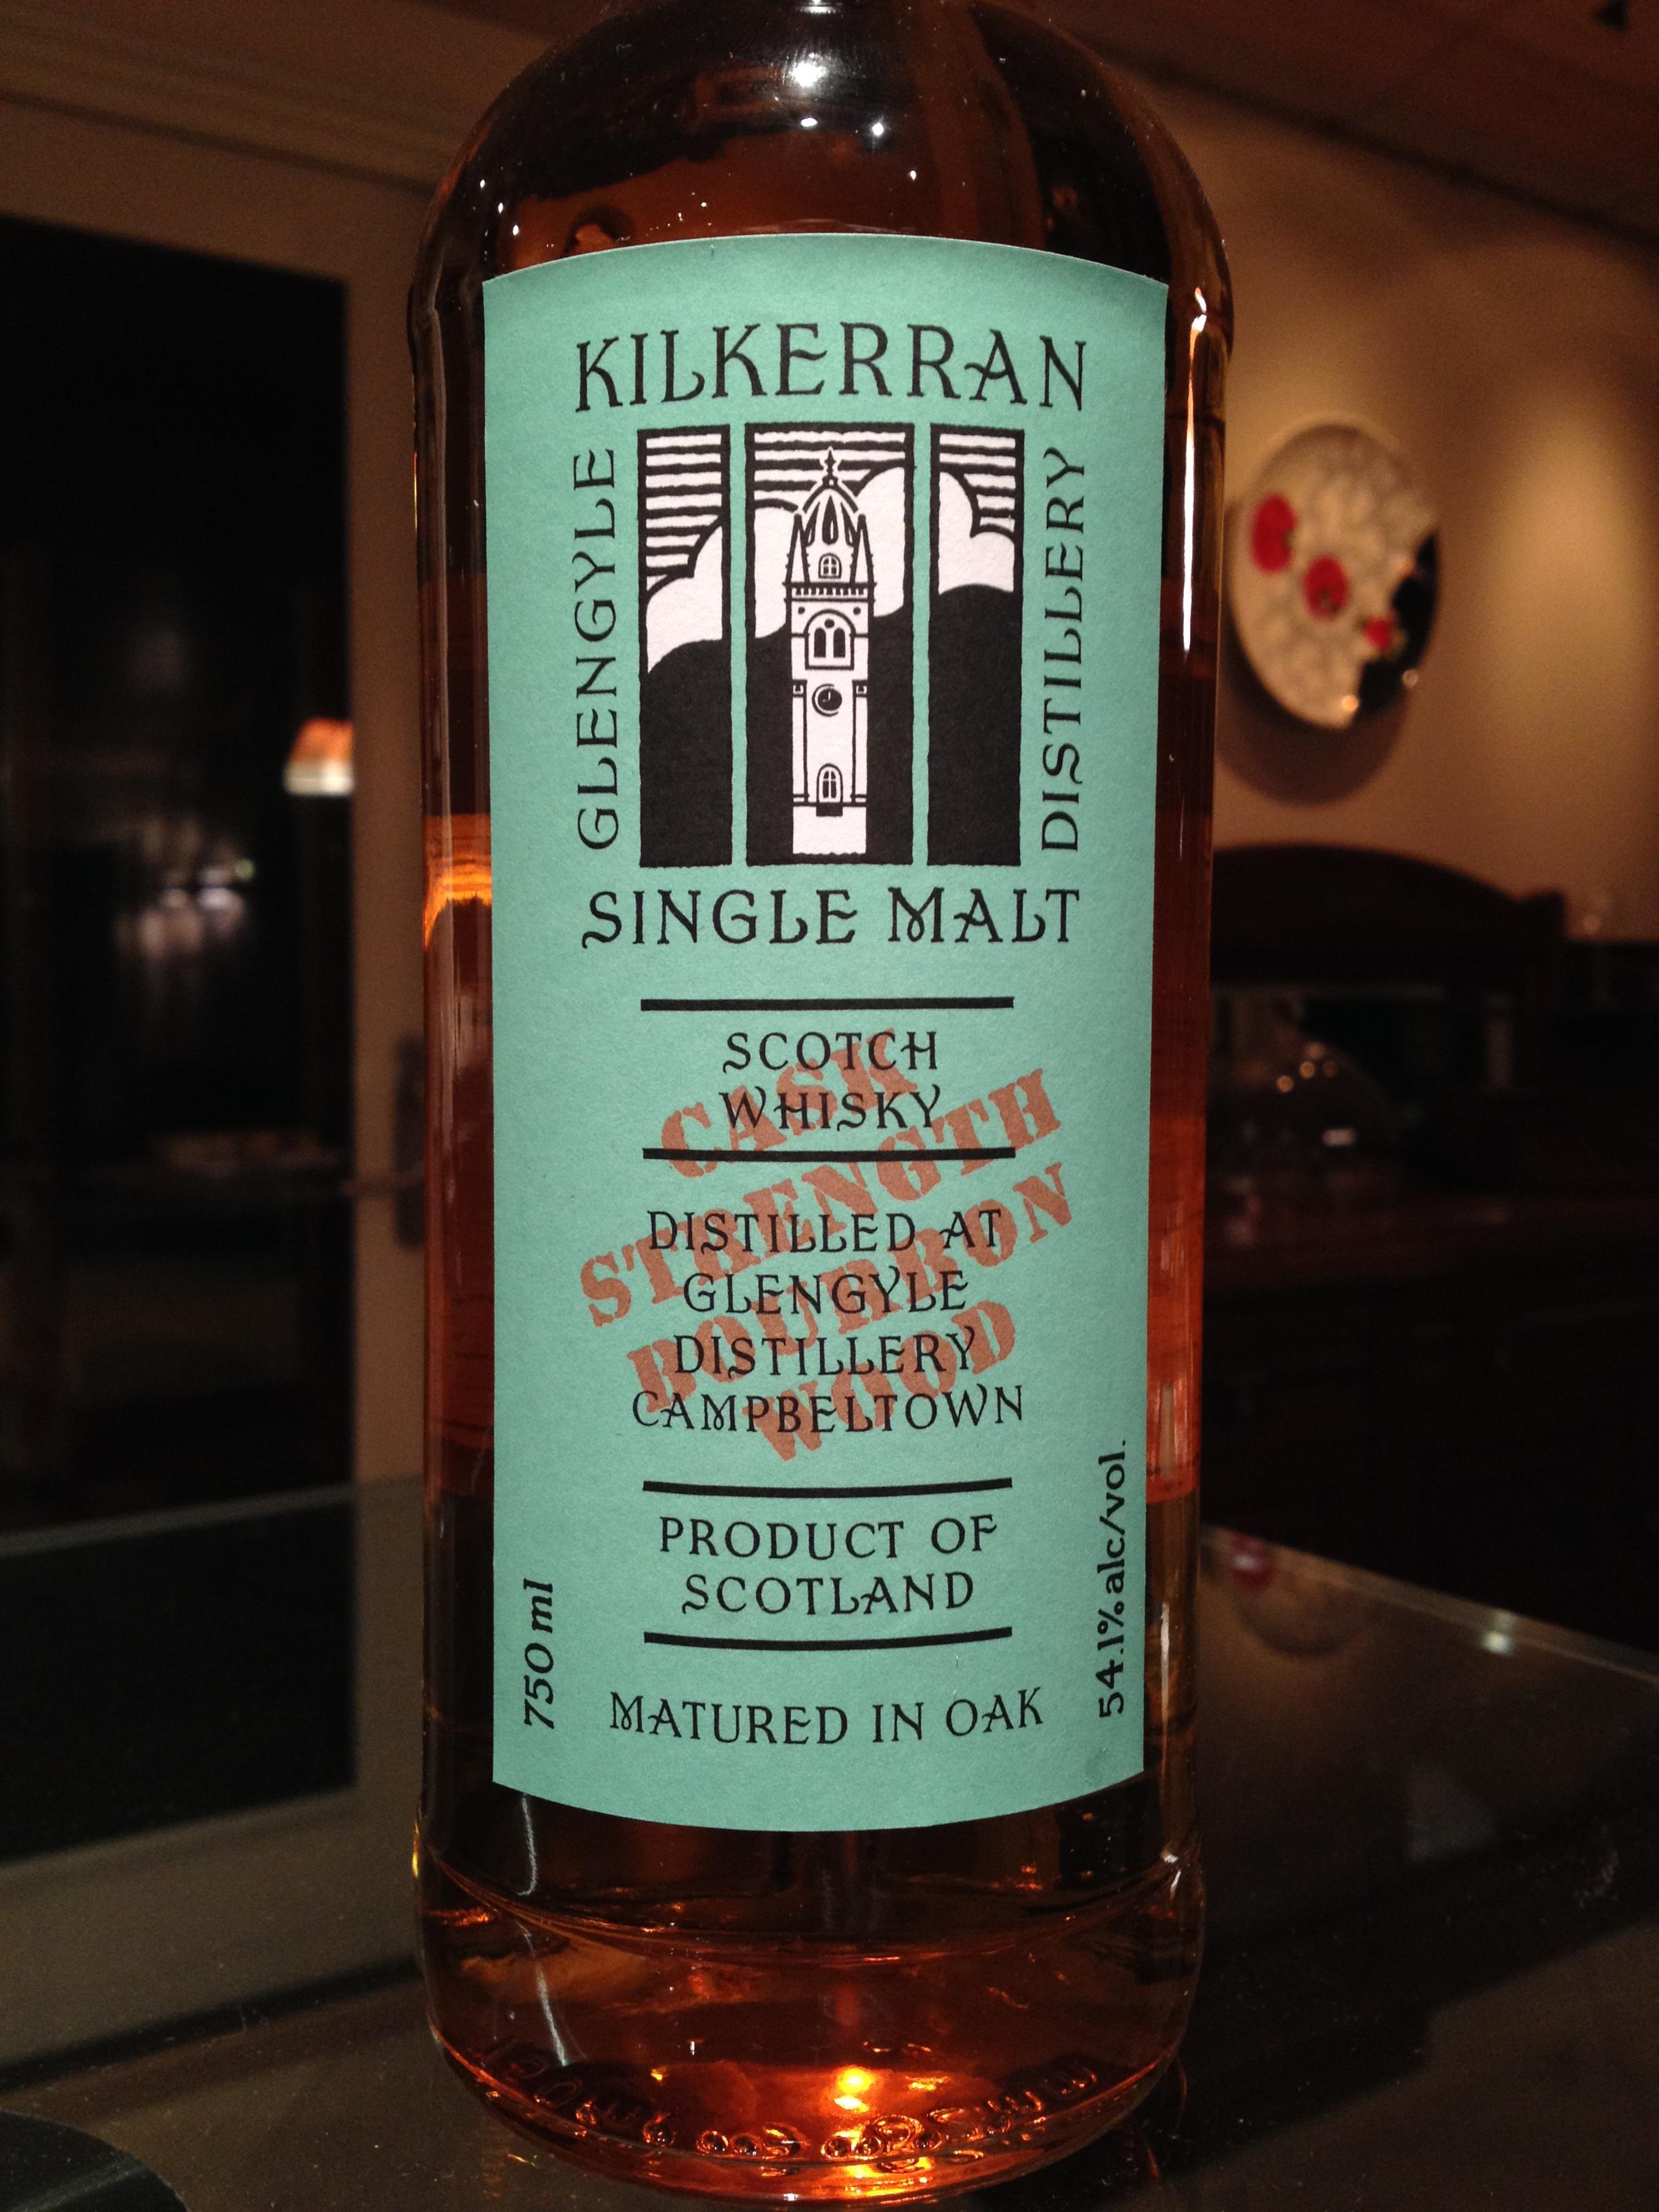 11 Year Old | 54.1% ABV - Distillery | Glengyle